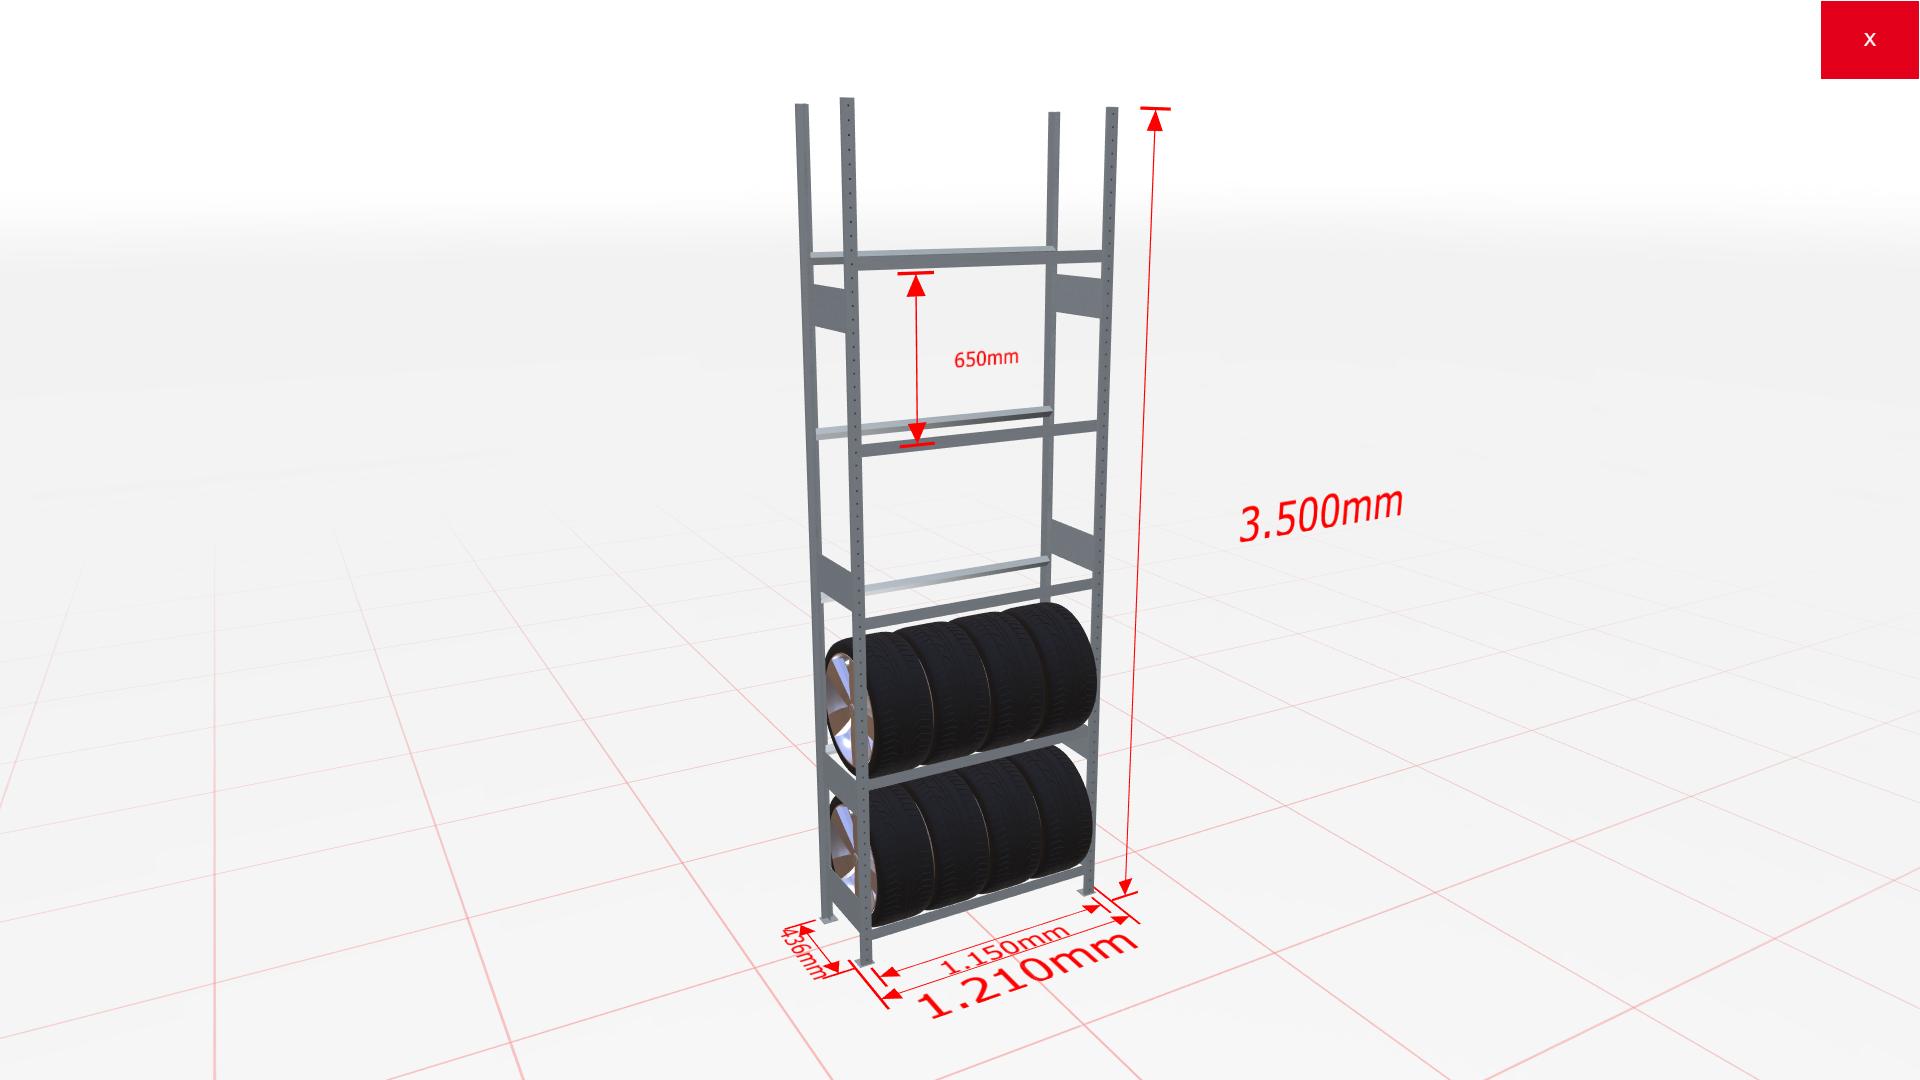 Räderregal Grundregal SCHULTE Lagertechnik 3500x1150x400 mm – 5 Ebenen á 1150 mm, verzinkt